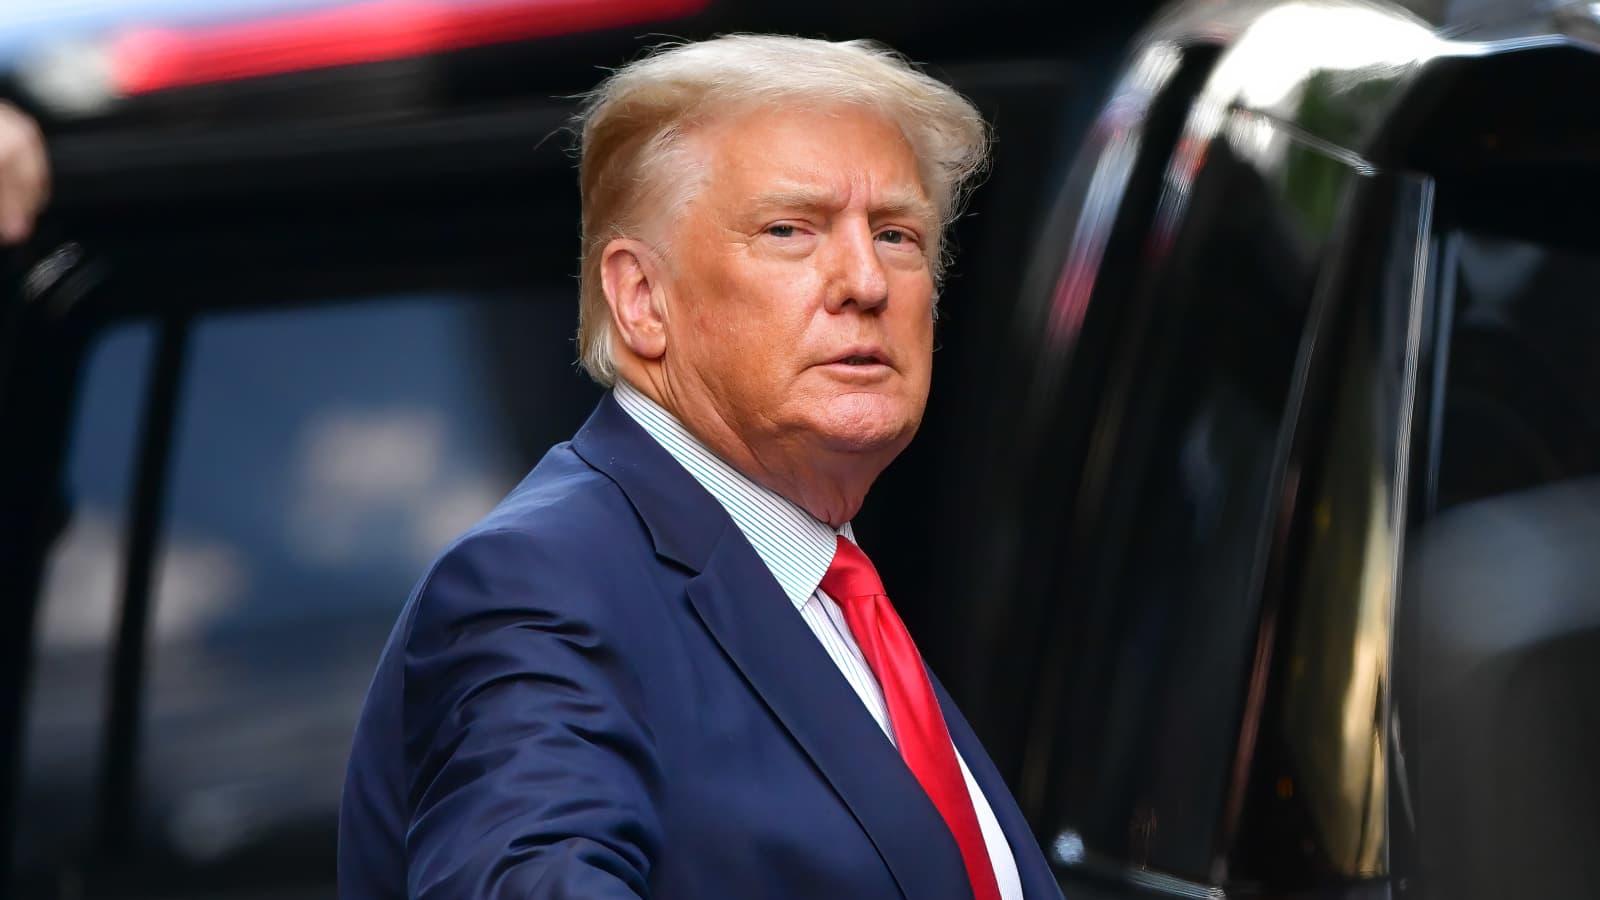 Manhattan DA convenes grand jury in Trump investigation, report says